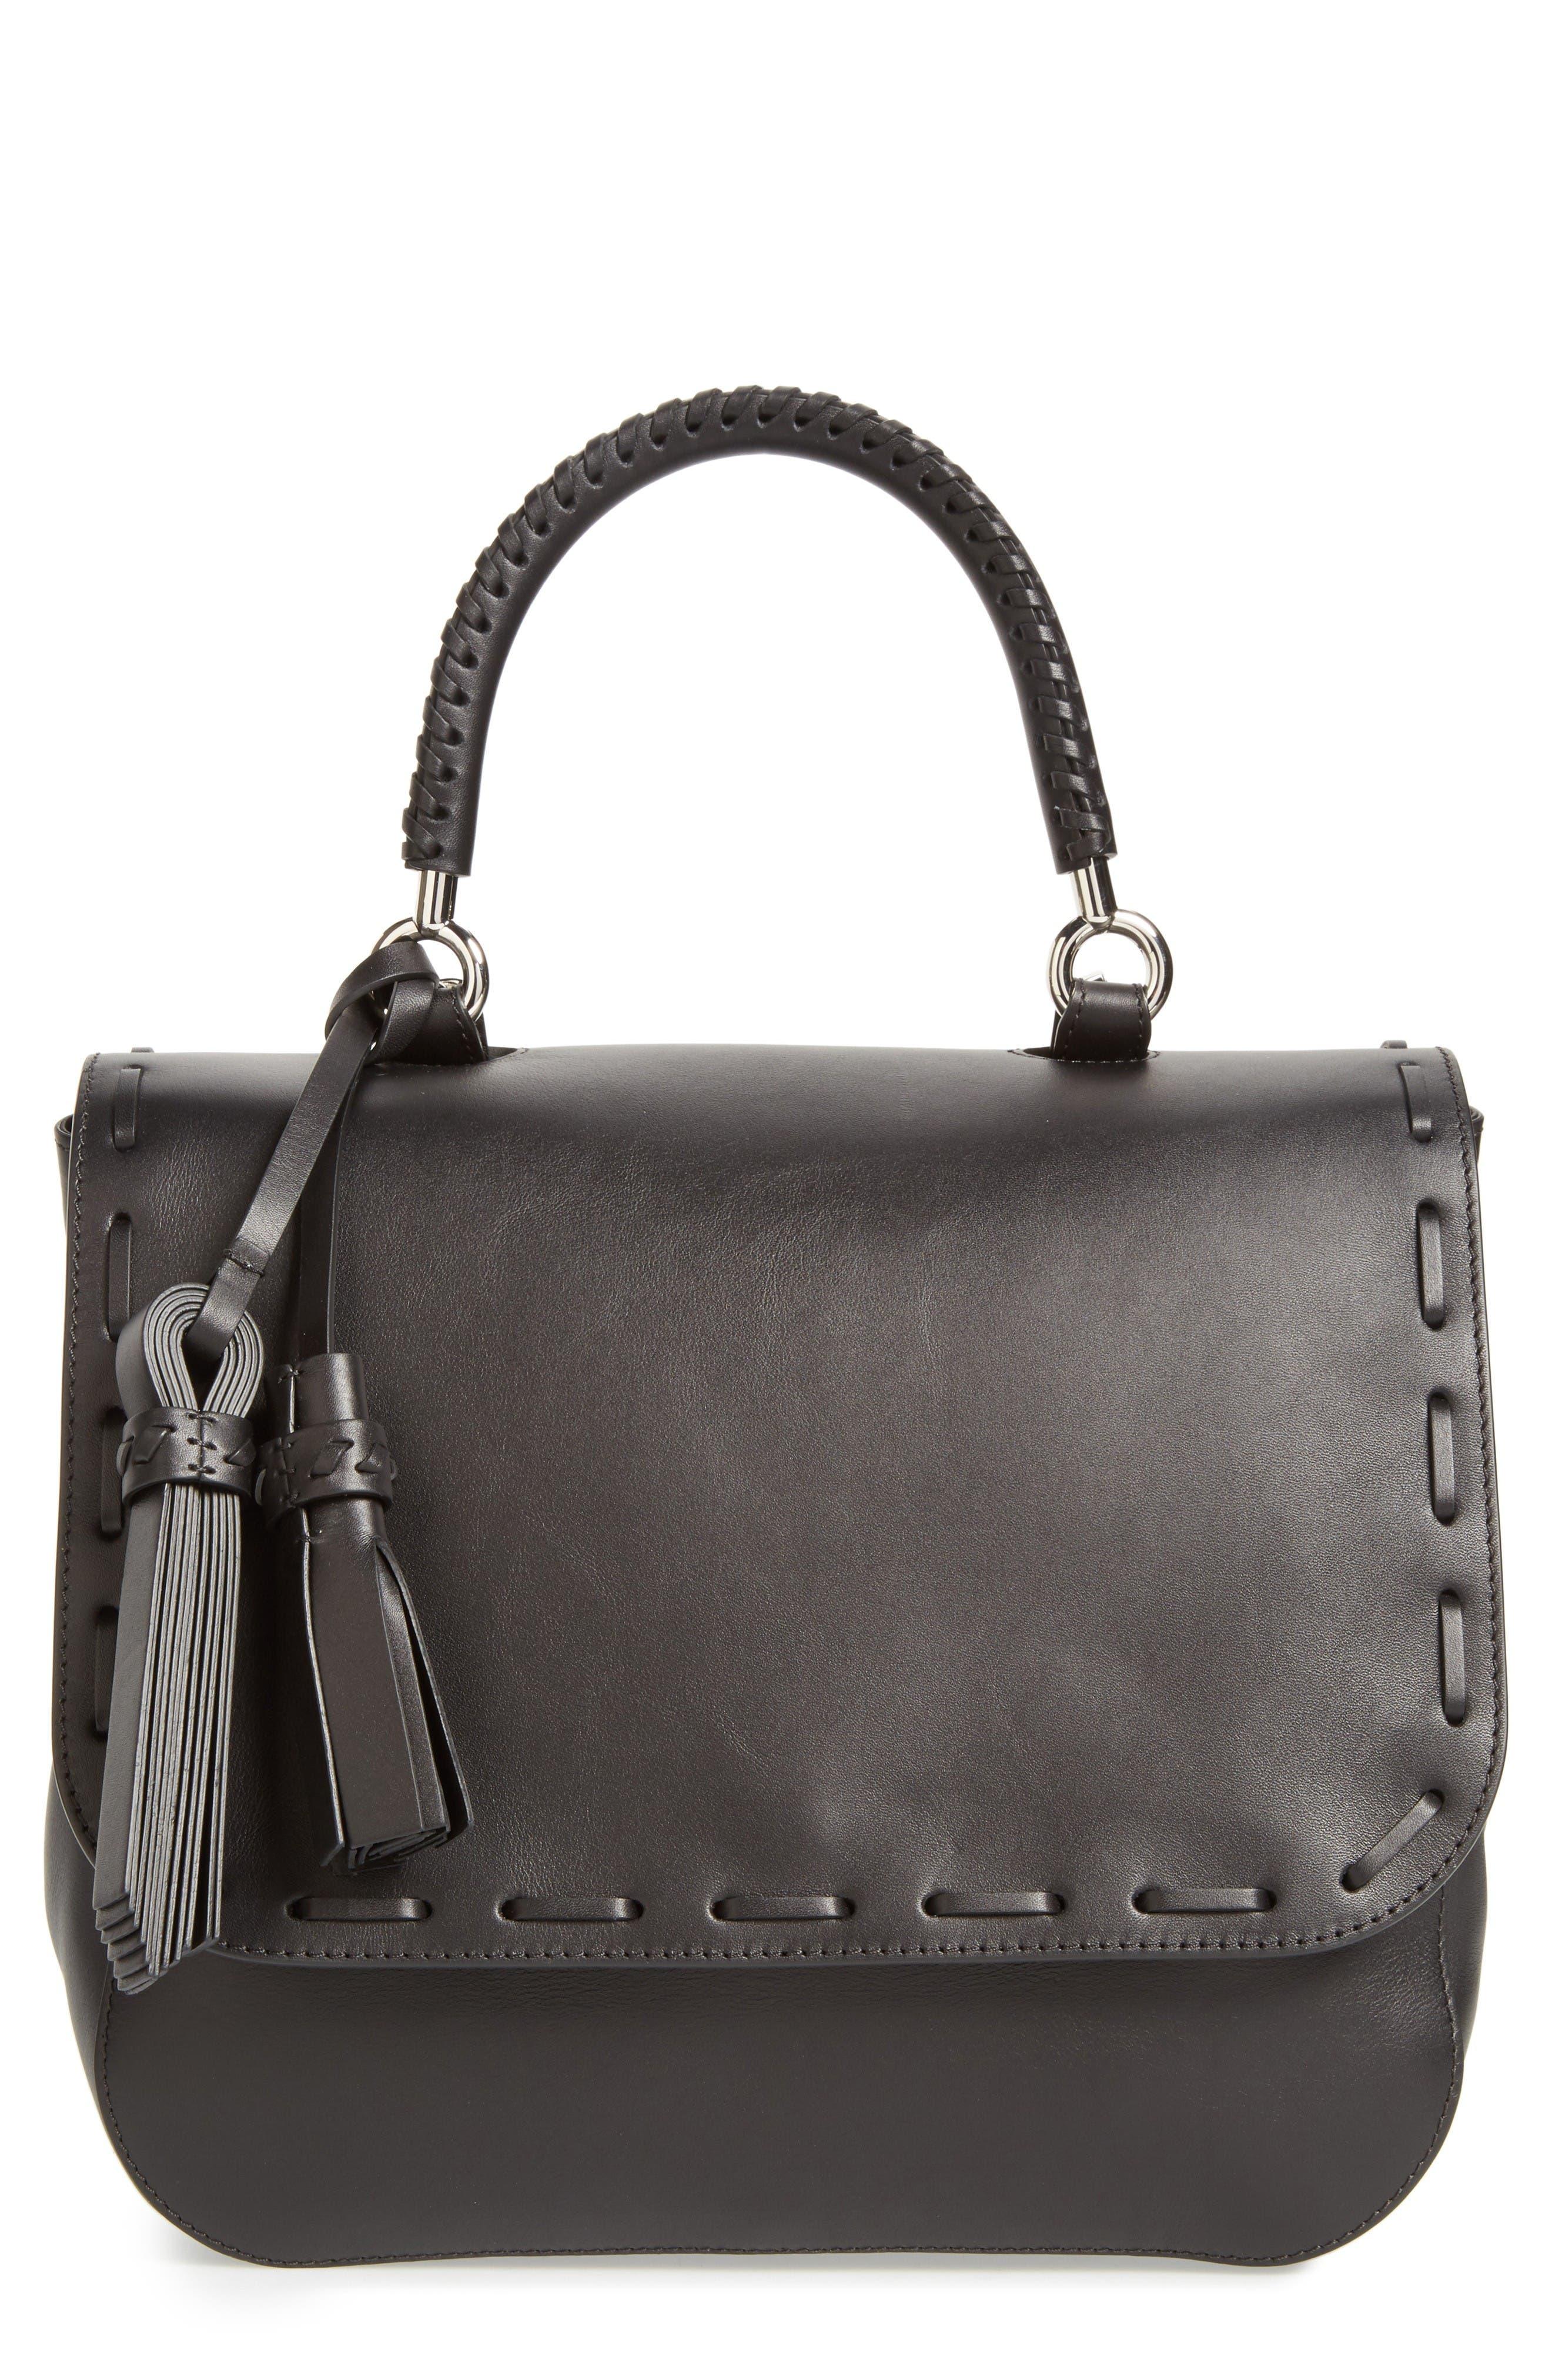 Main Image - Max Mara BoBag Leather Satchel